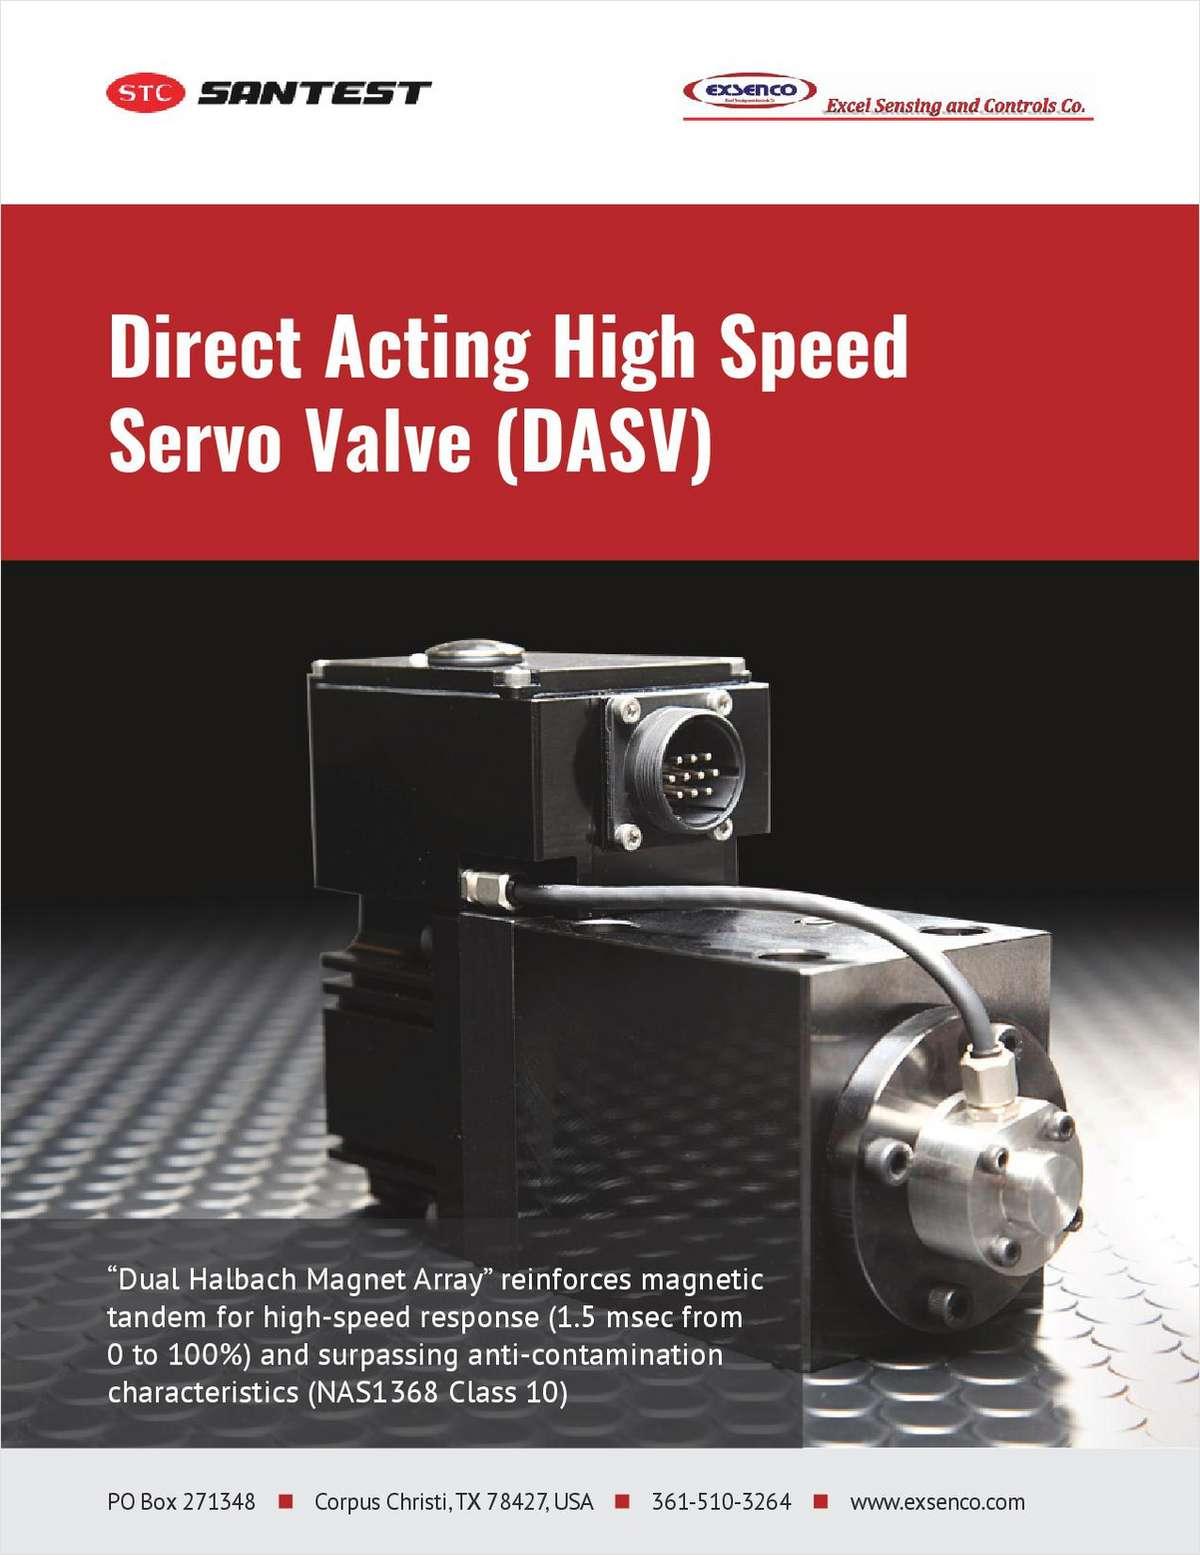 Direct Acting High Speed Servo Valve (DASV)